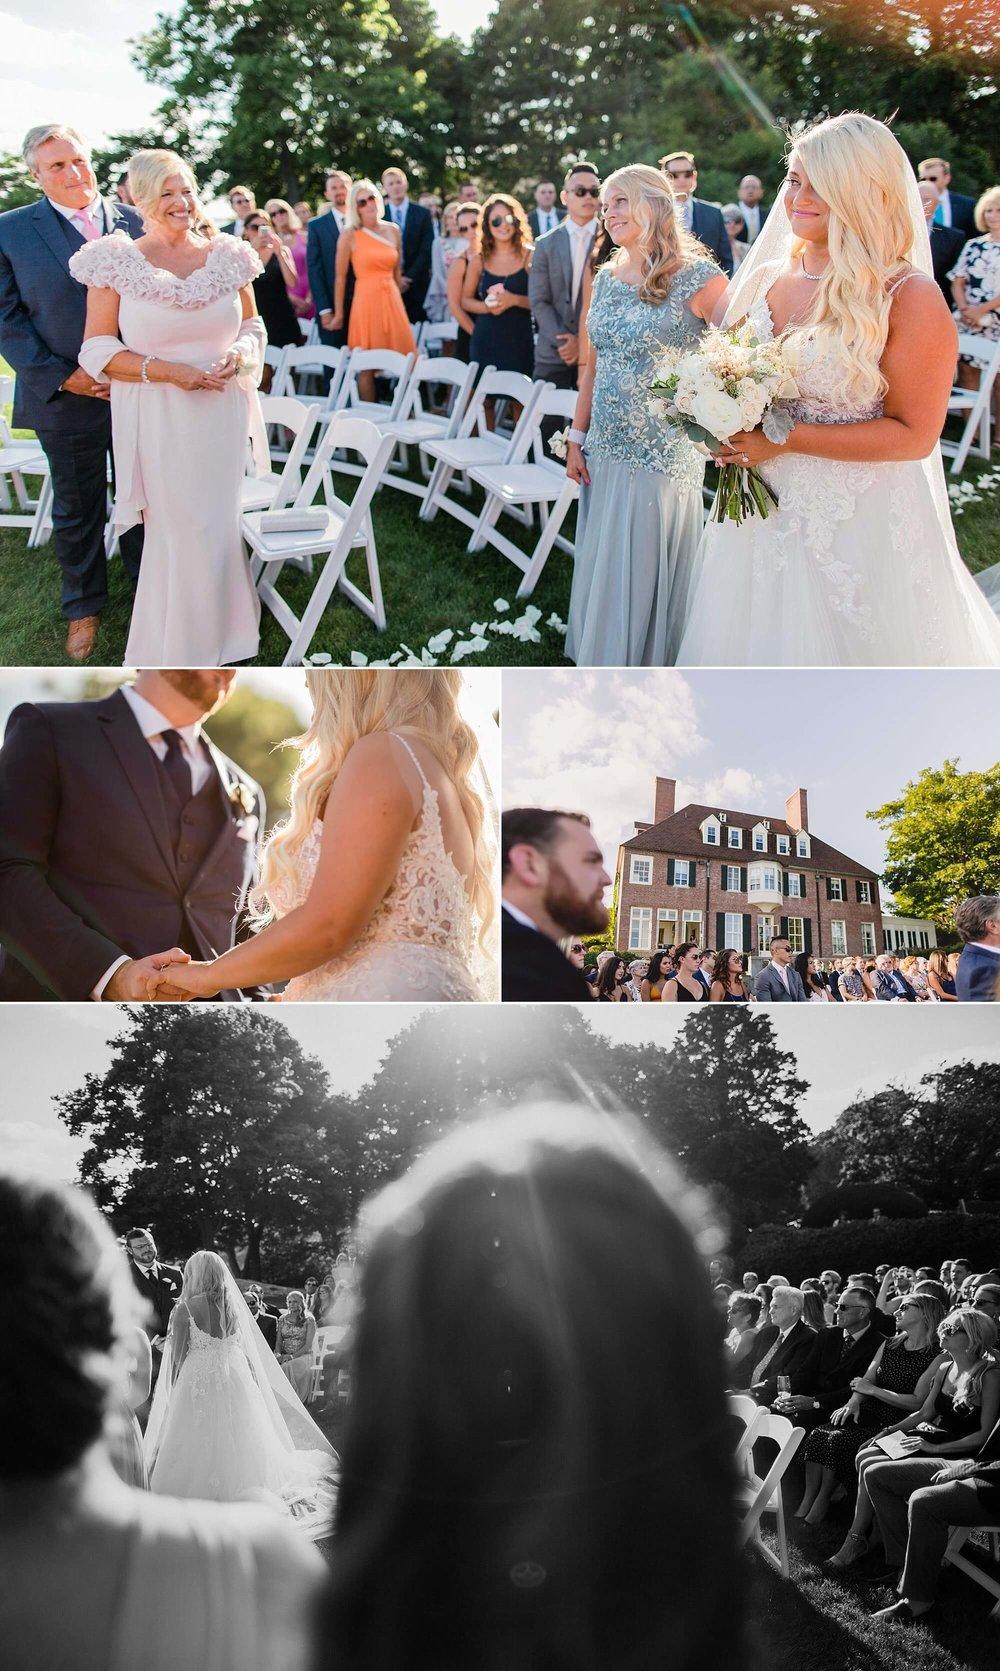 Misselwood Wedding - Ebersole photo-33.jpg